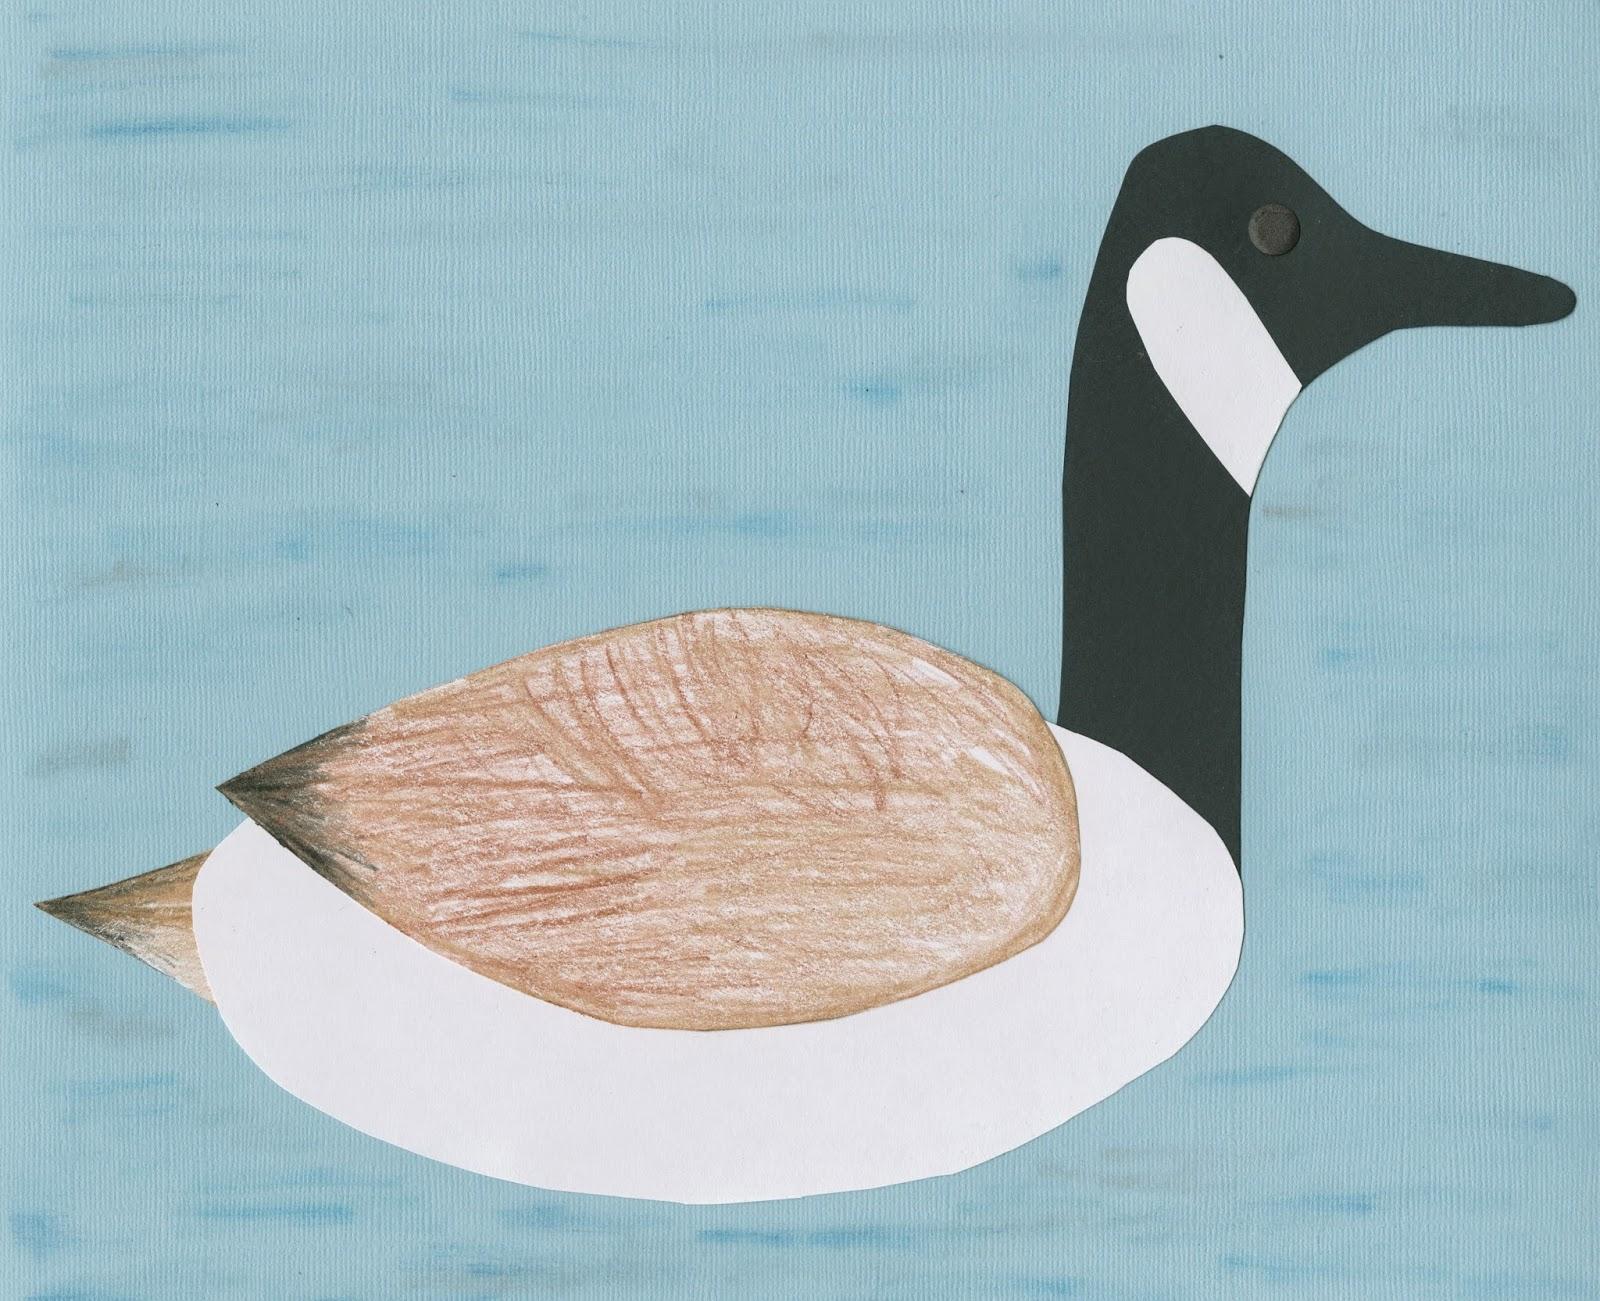 Canada Goose Fun Family Crafts